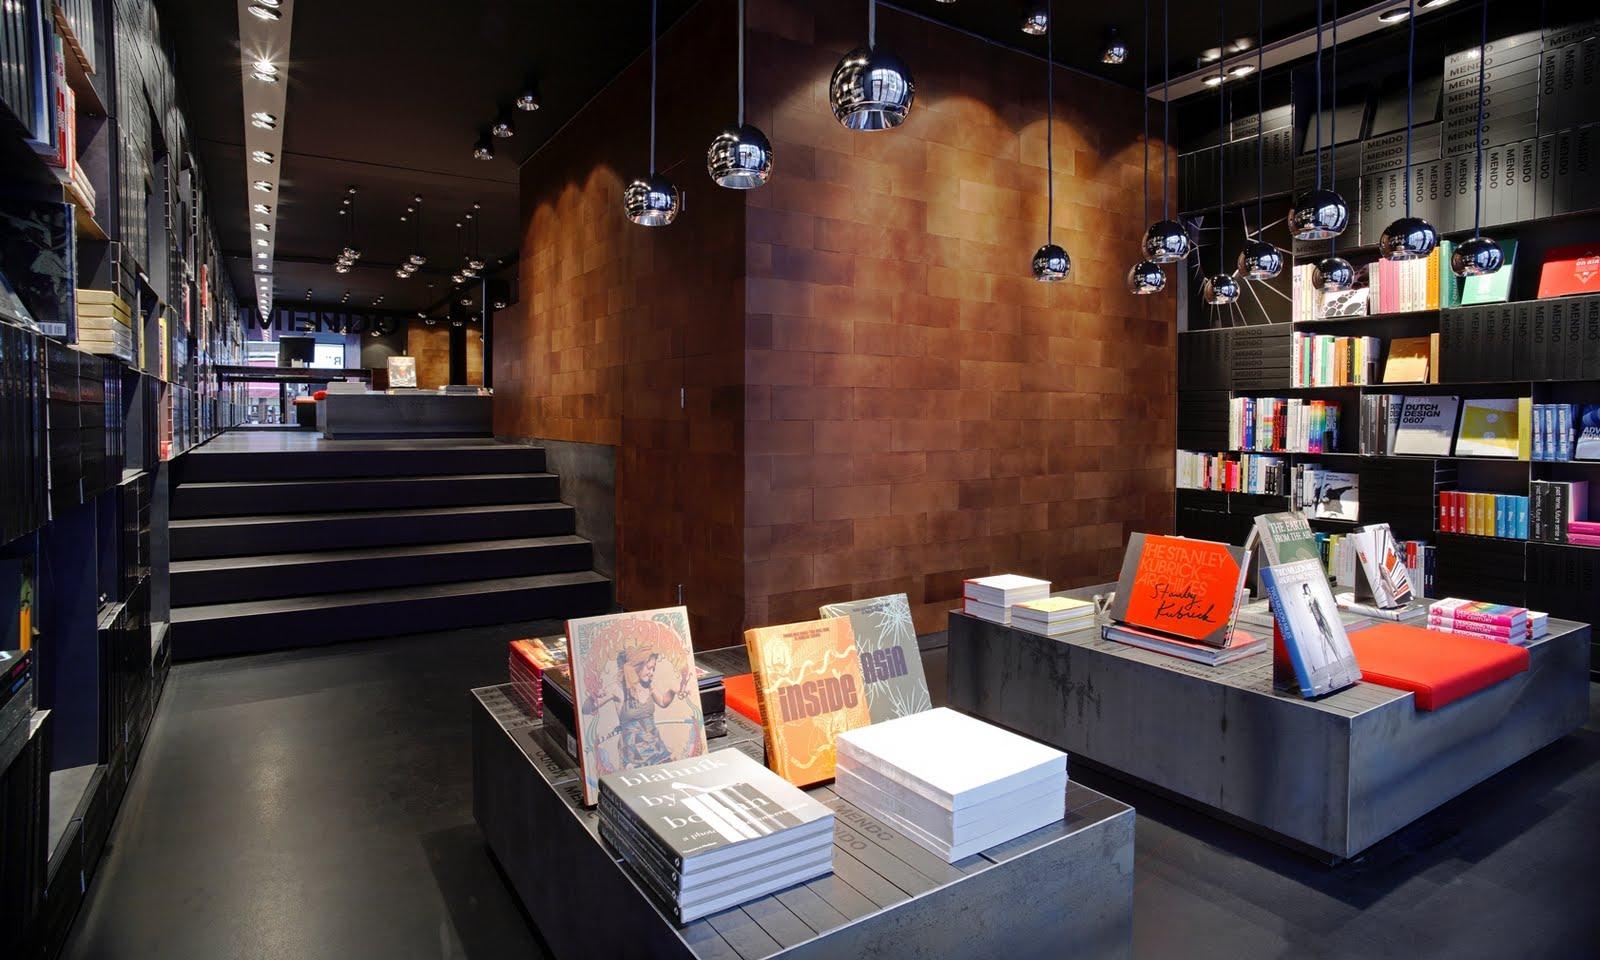 Design Toko Buku Desain Interior Toko Buku